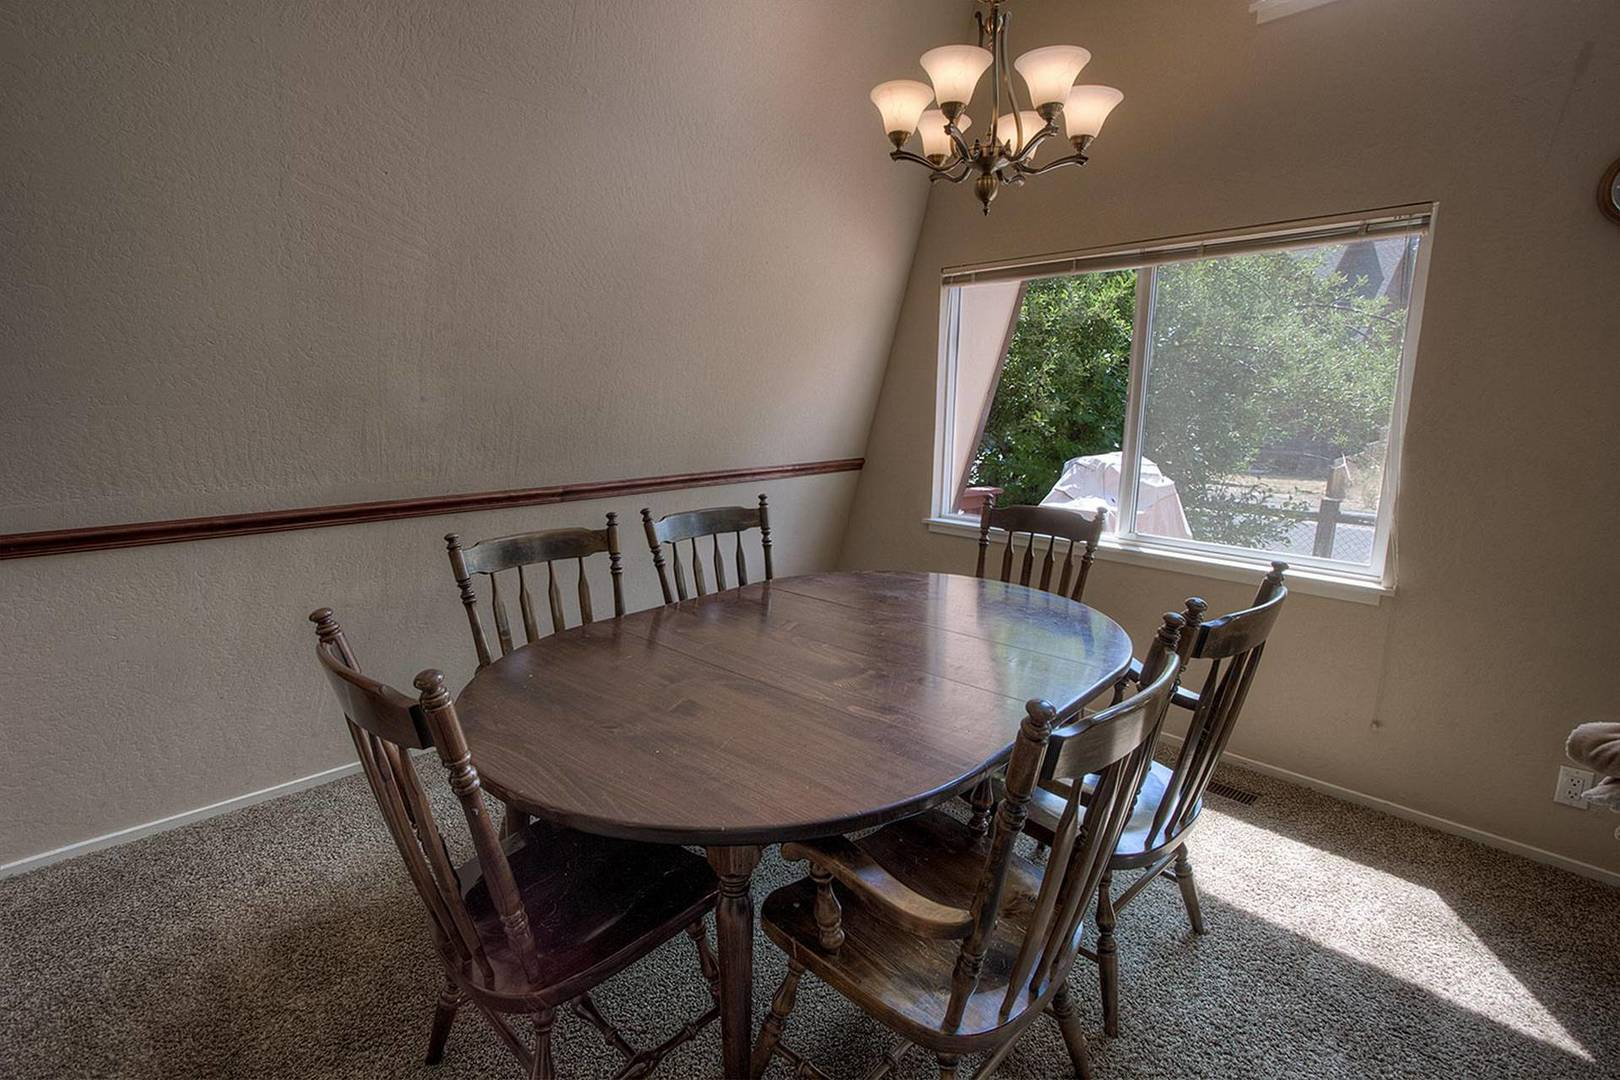 cyh1046 dining room